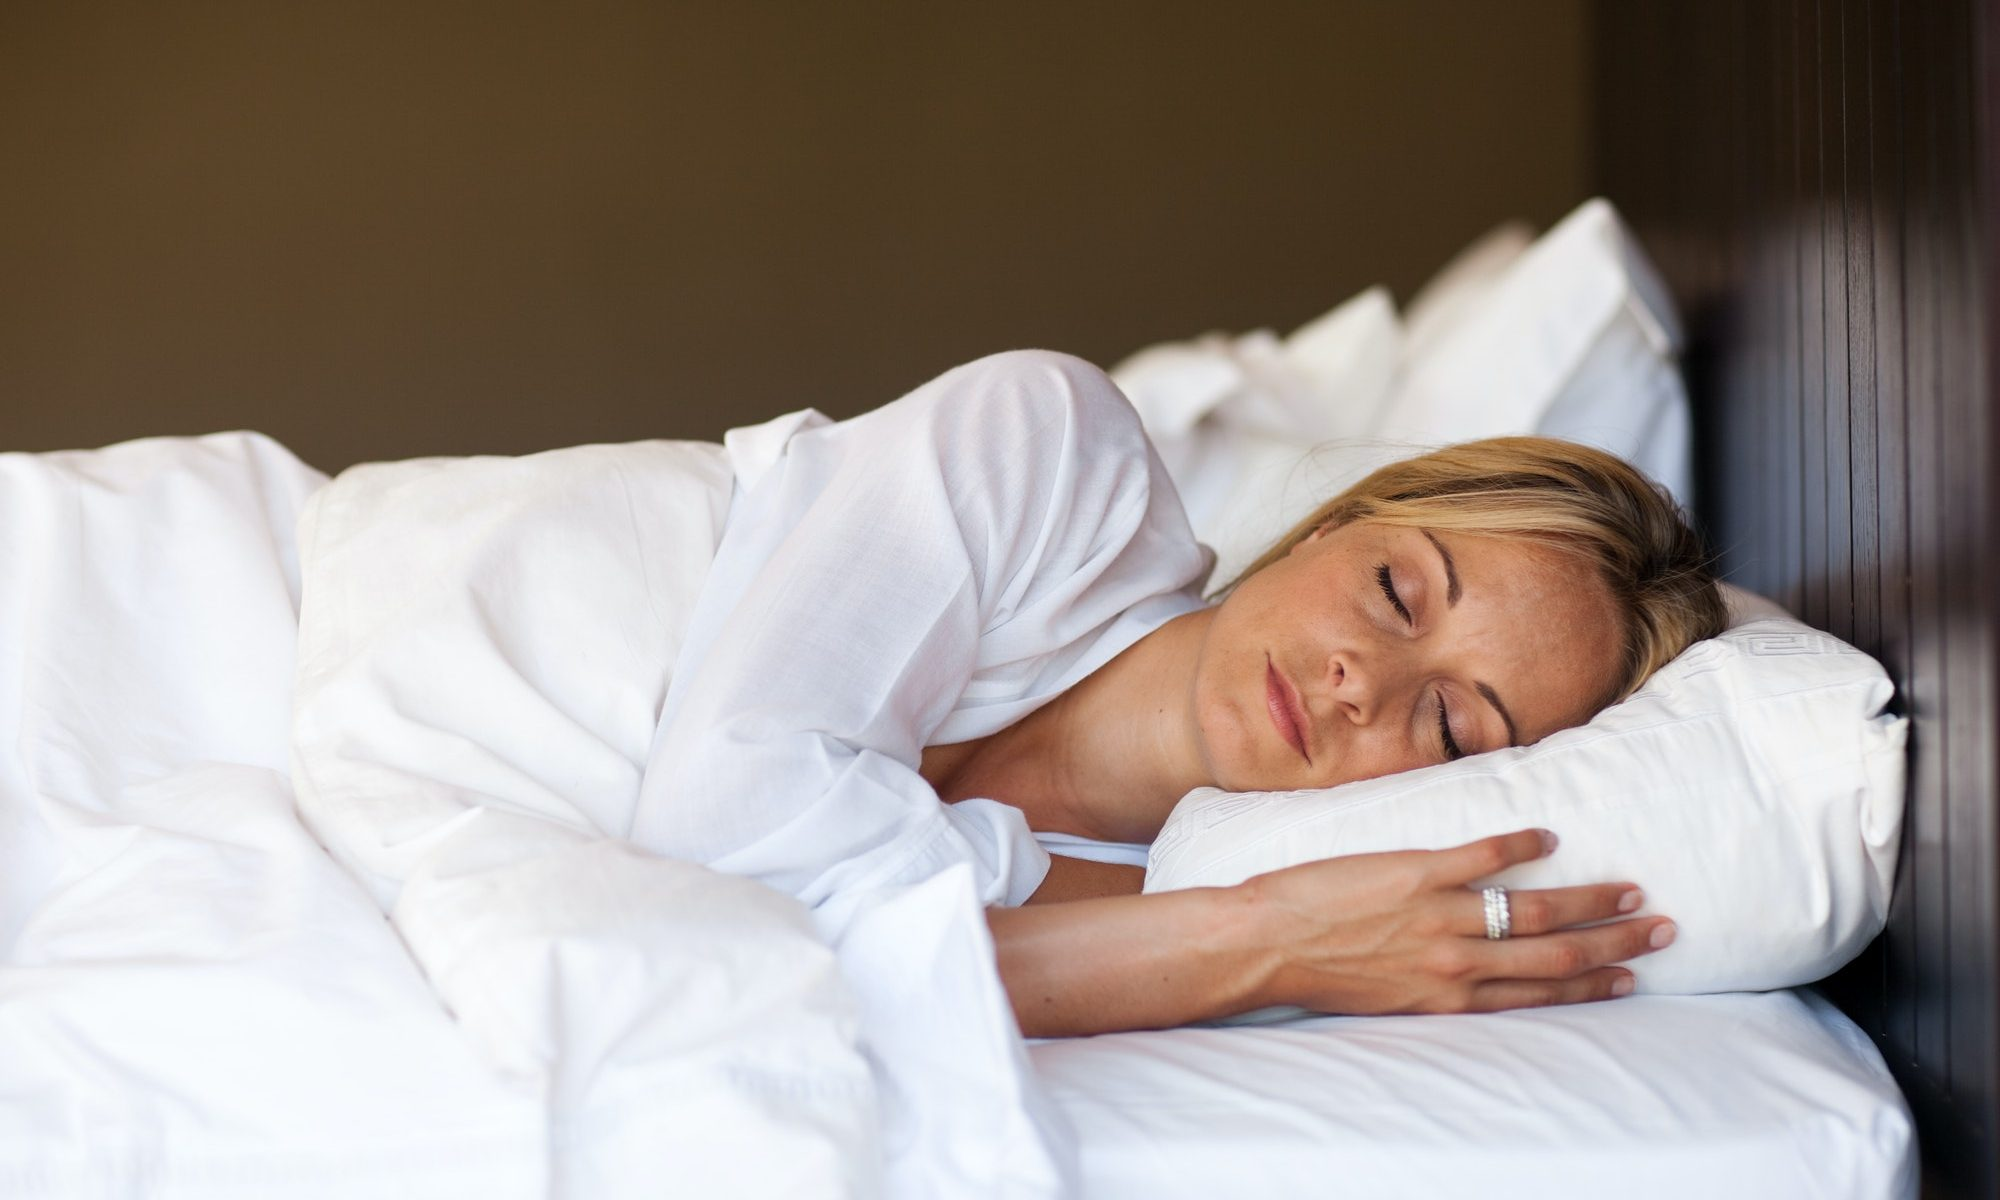 Bahaya Tidur Setelah Sahur untuk Kesehatan